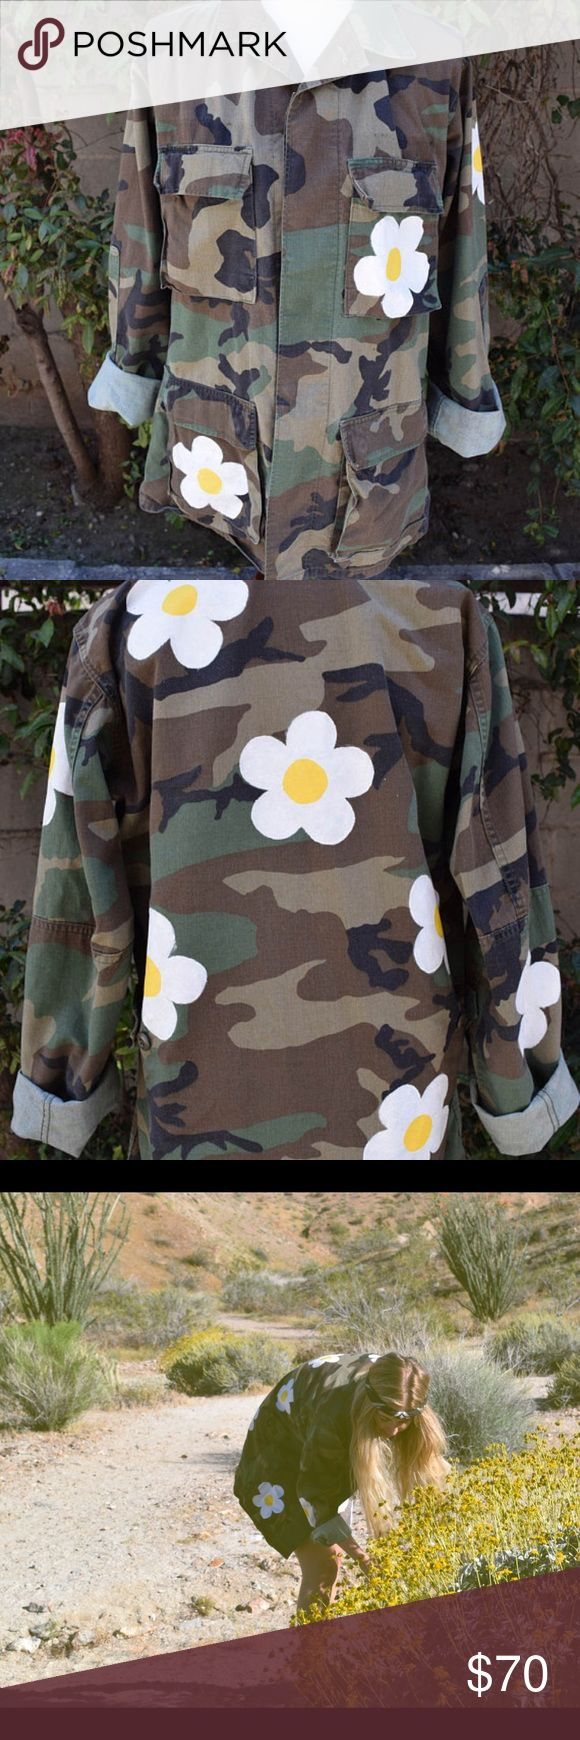 Selling this 🌼Vintage Daisy Camouflage Jacket 🌼 on Poshmark! My username is: thelittlegypsy1. #shopmycloset #poshmark #fashion #shopping #style #forsale #Free People #Jackets & Blazers